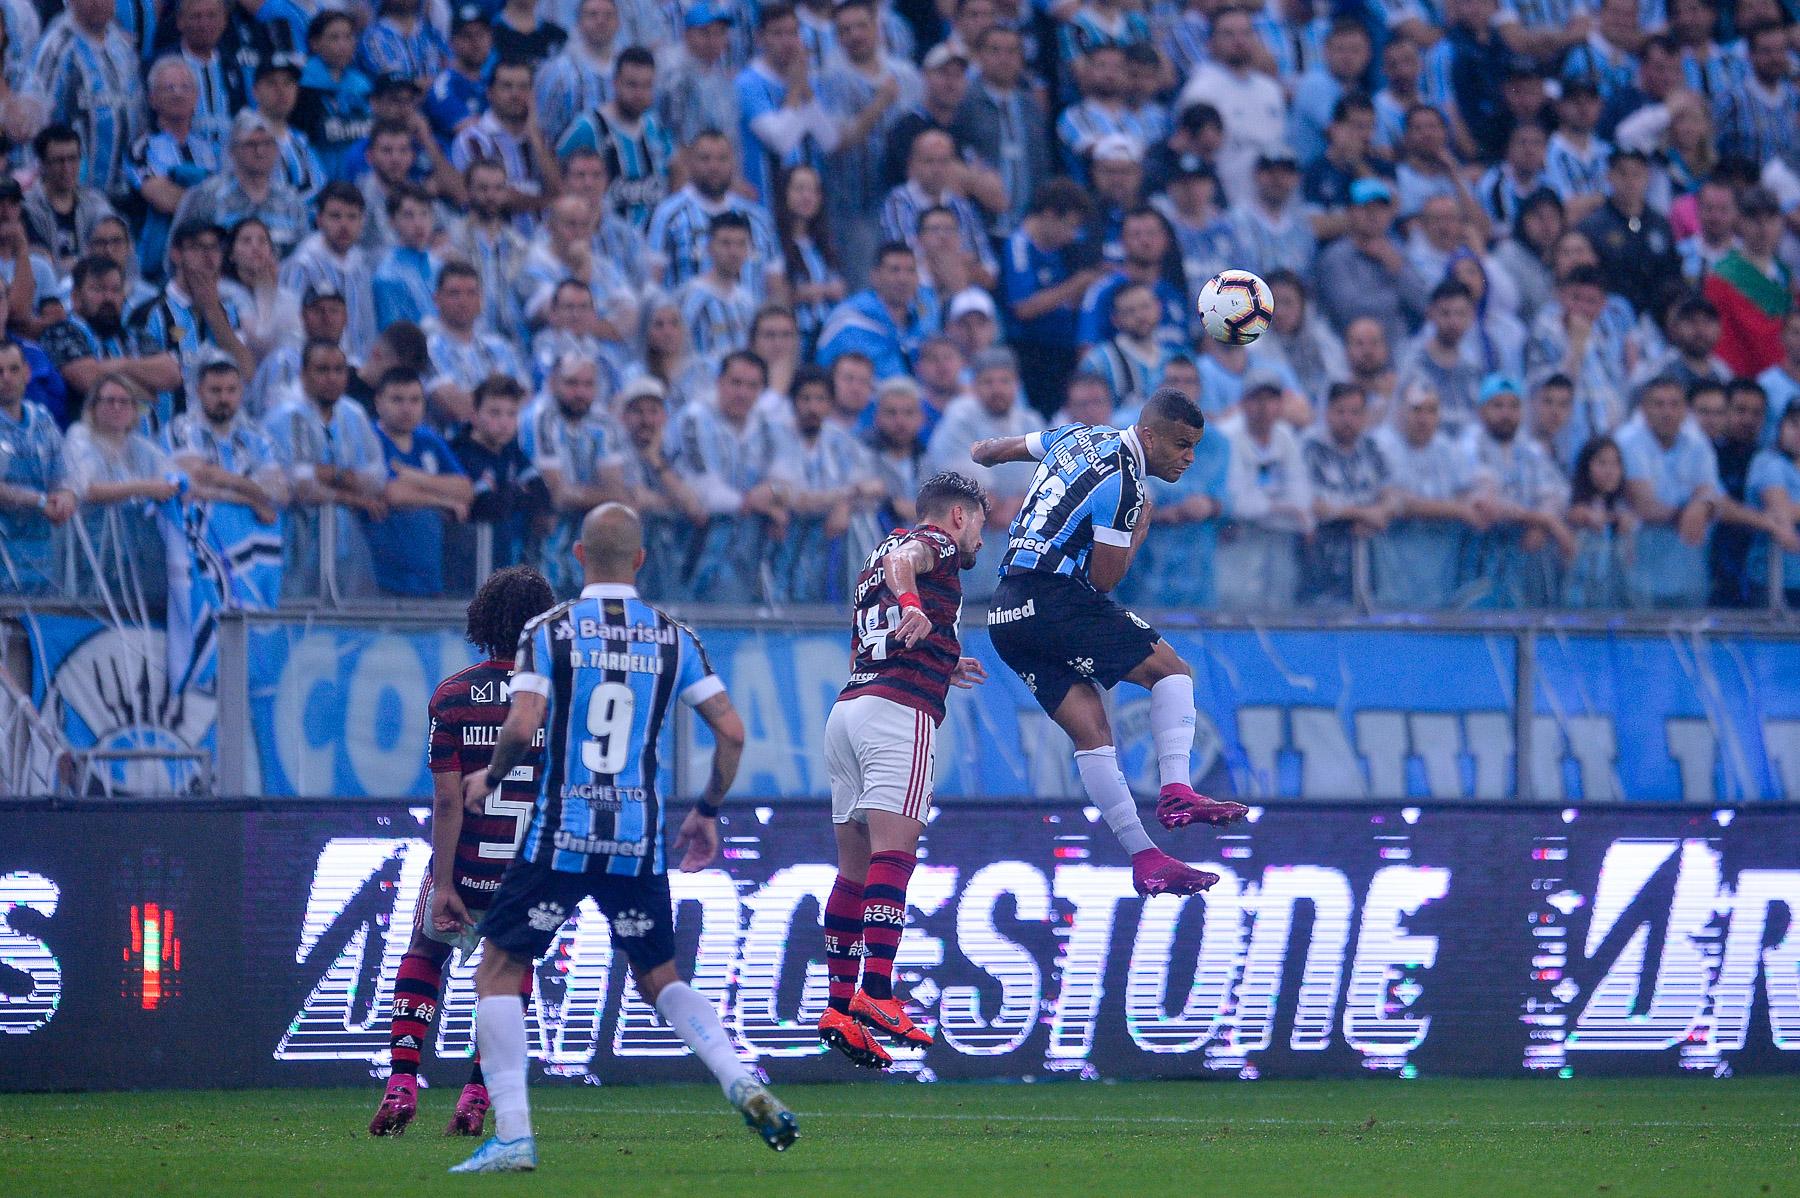 Gremio_X_Flamengo_dudabairros_Eleven_128